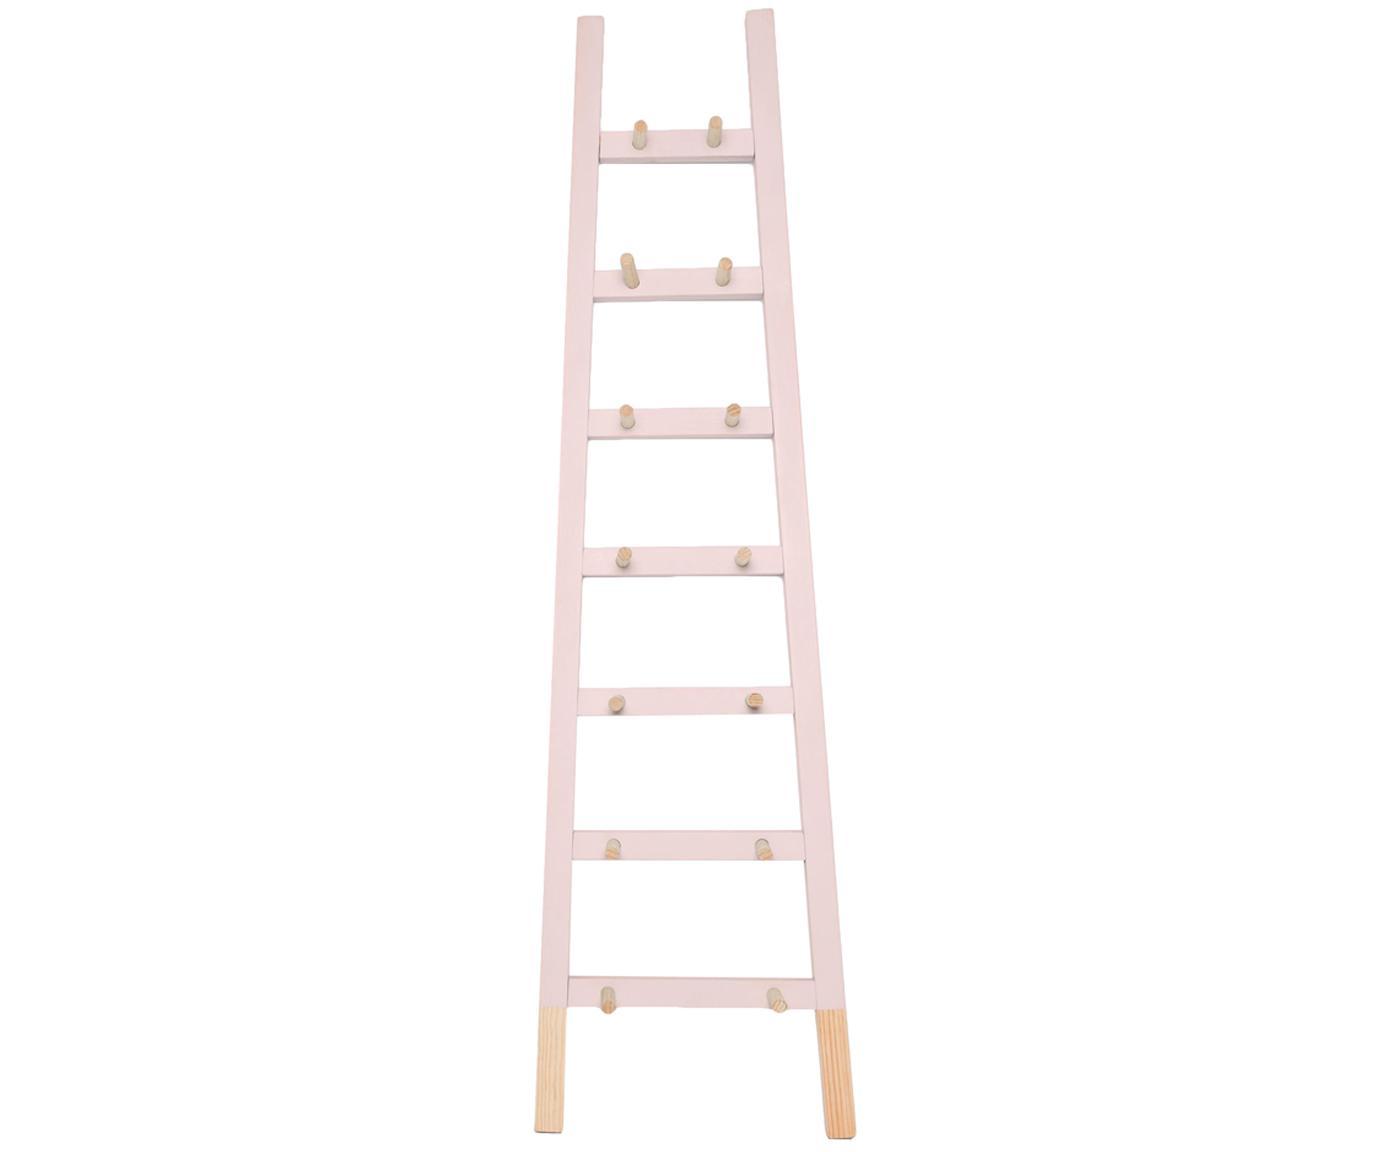 Estantería escalera de pared Helia, Madera de pino, recubierta, Rosa, madera de pino, An 46 x Al 170 cm